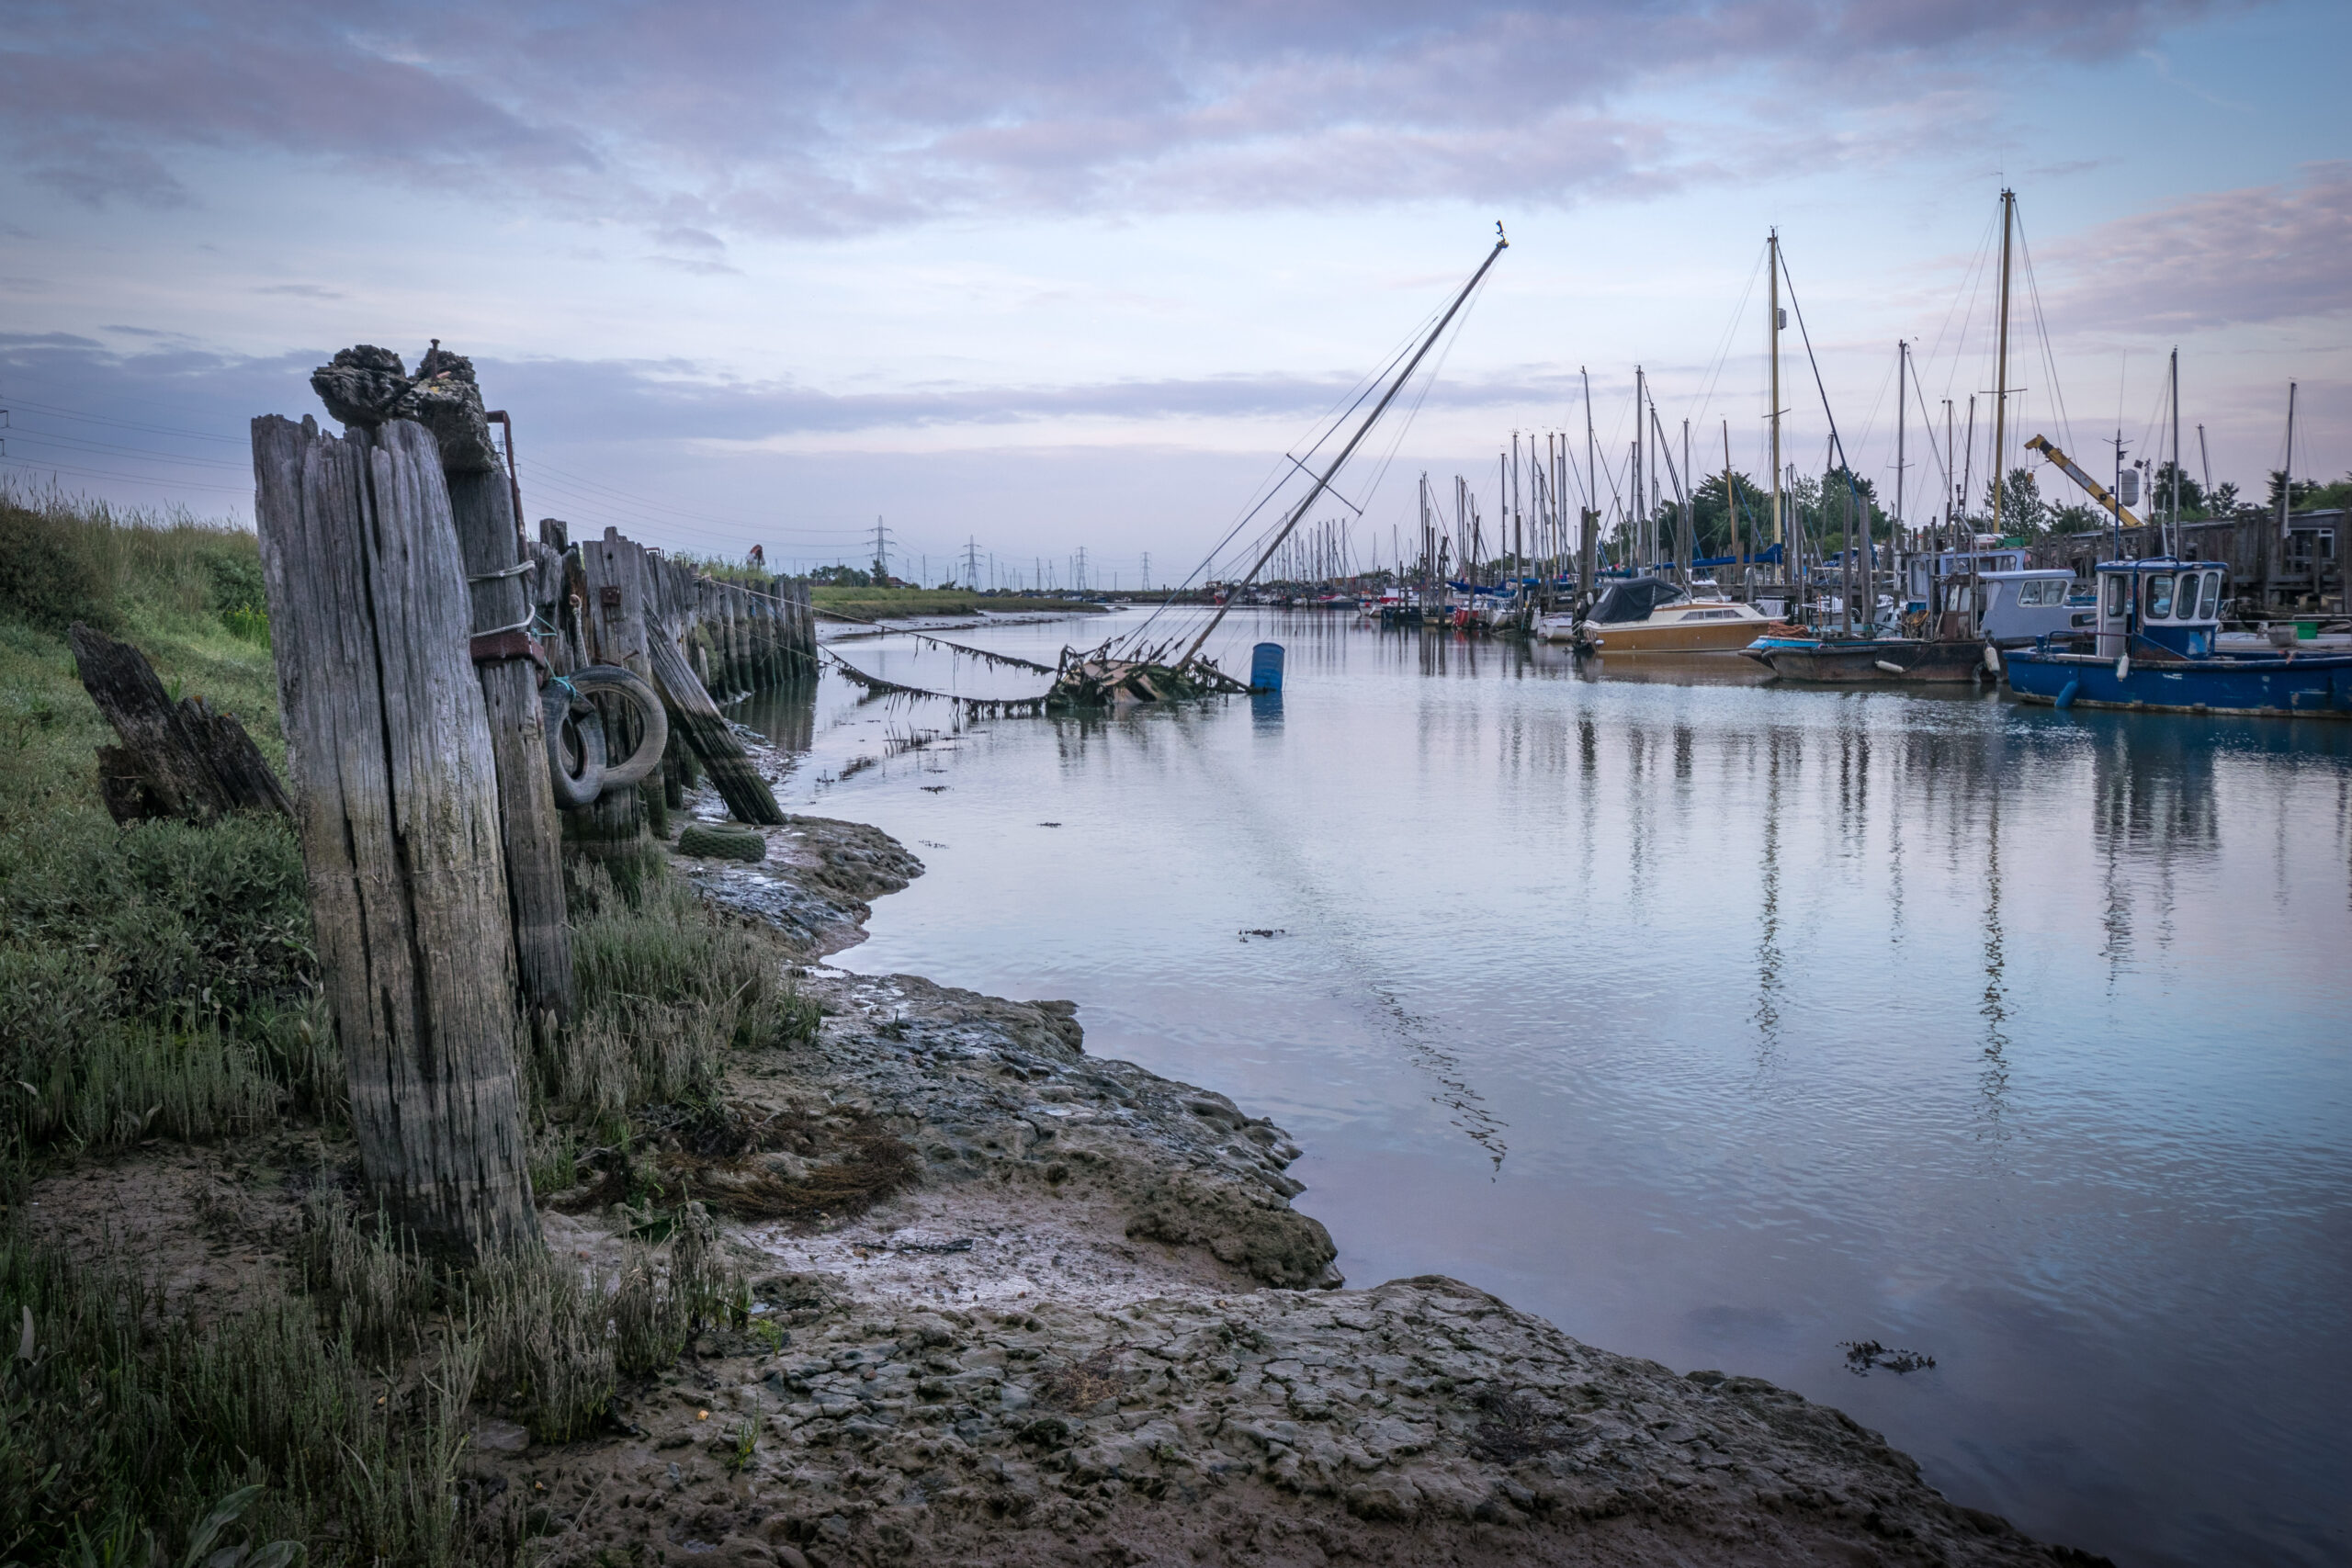 Moody photo of ship masts on Faversham creek.